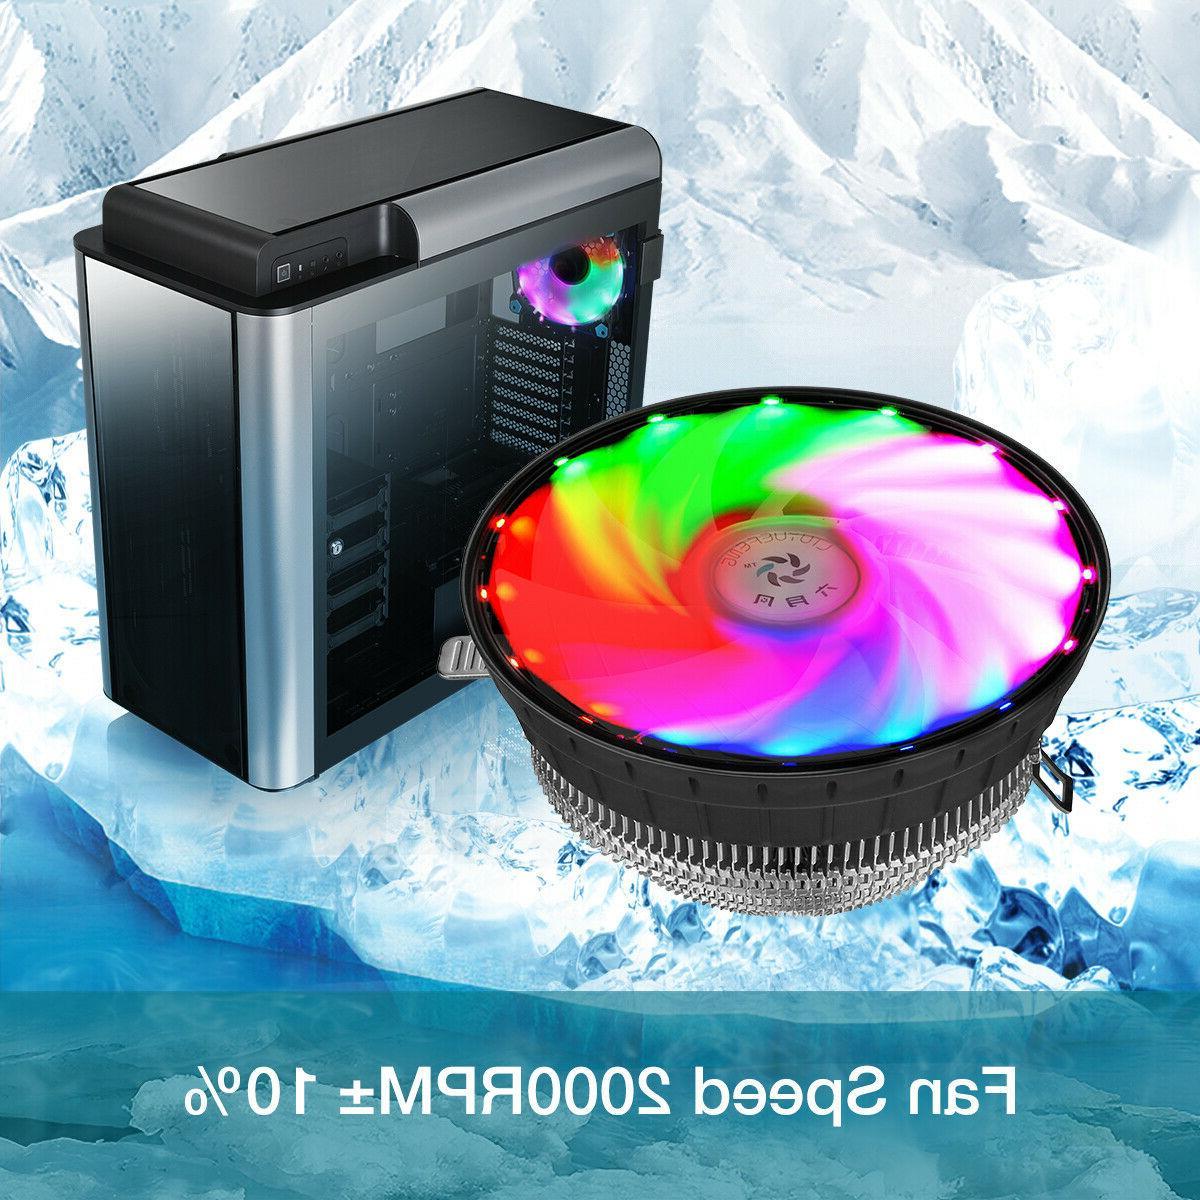 RGB LED CPU Fan Heatsink AM2+